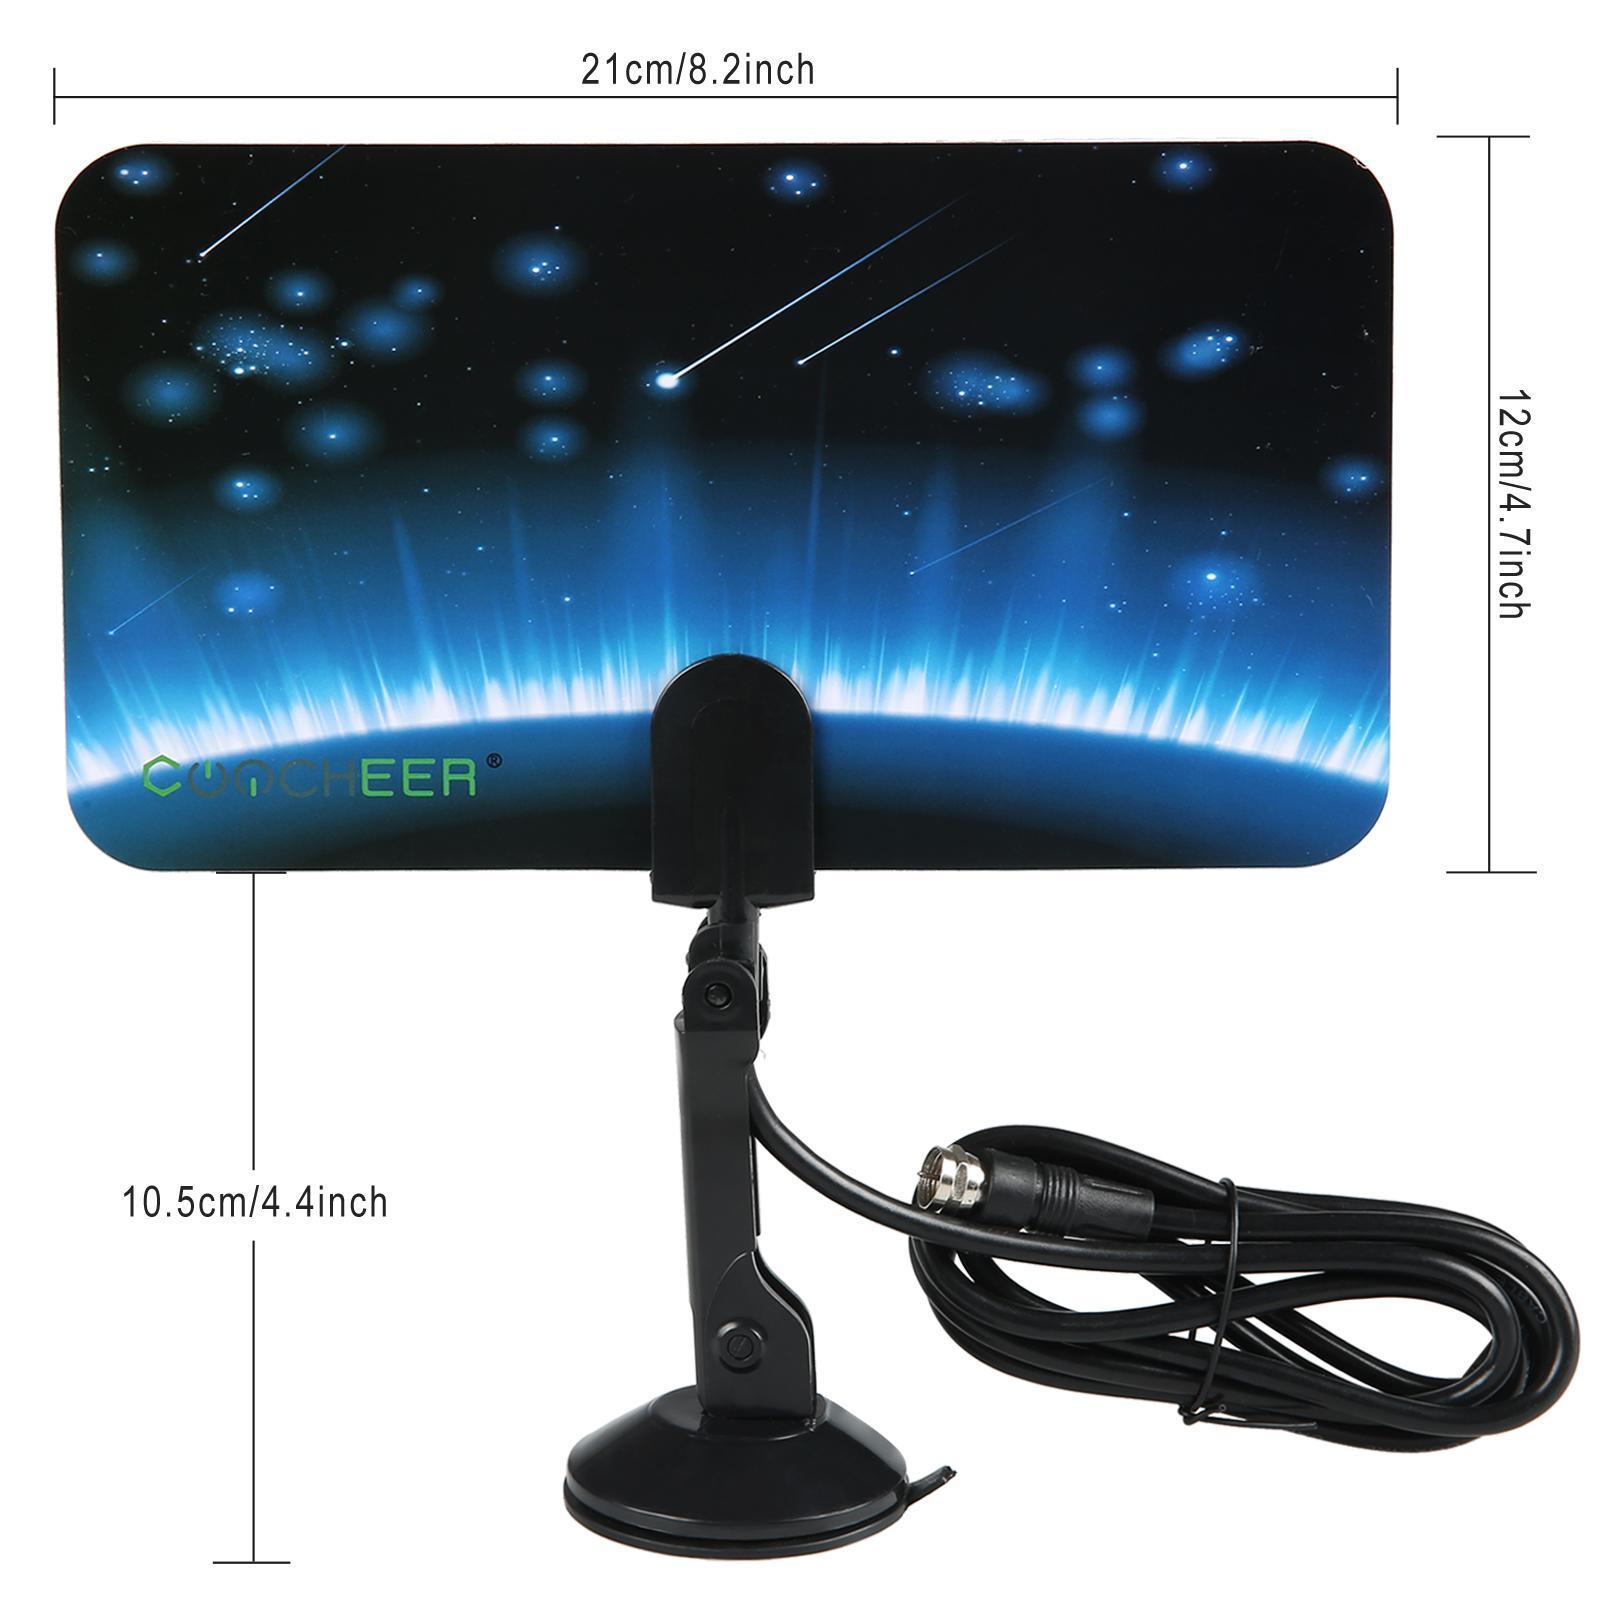 Digital TV Antenna Signal HDTV DTV Box Ready HD VHF UHF FM Stereo Flat Design 4